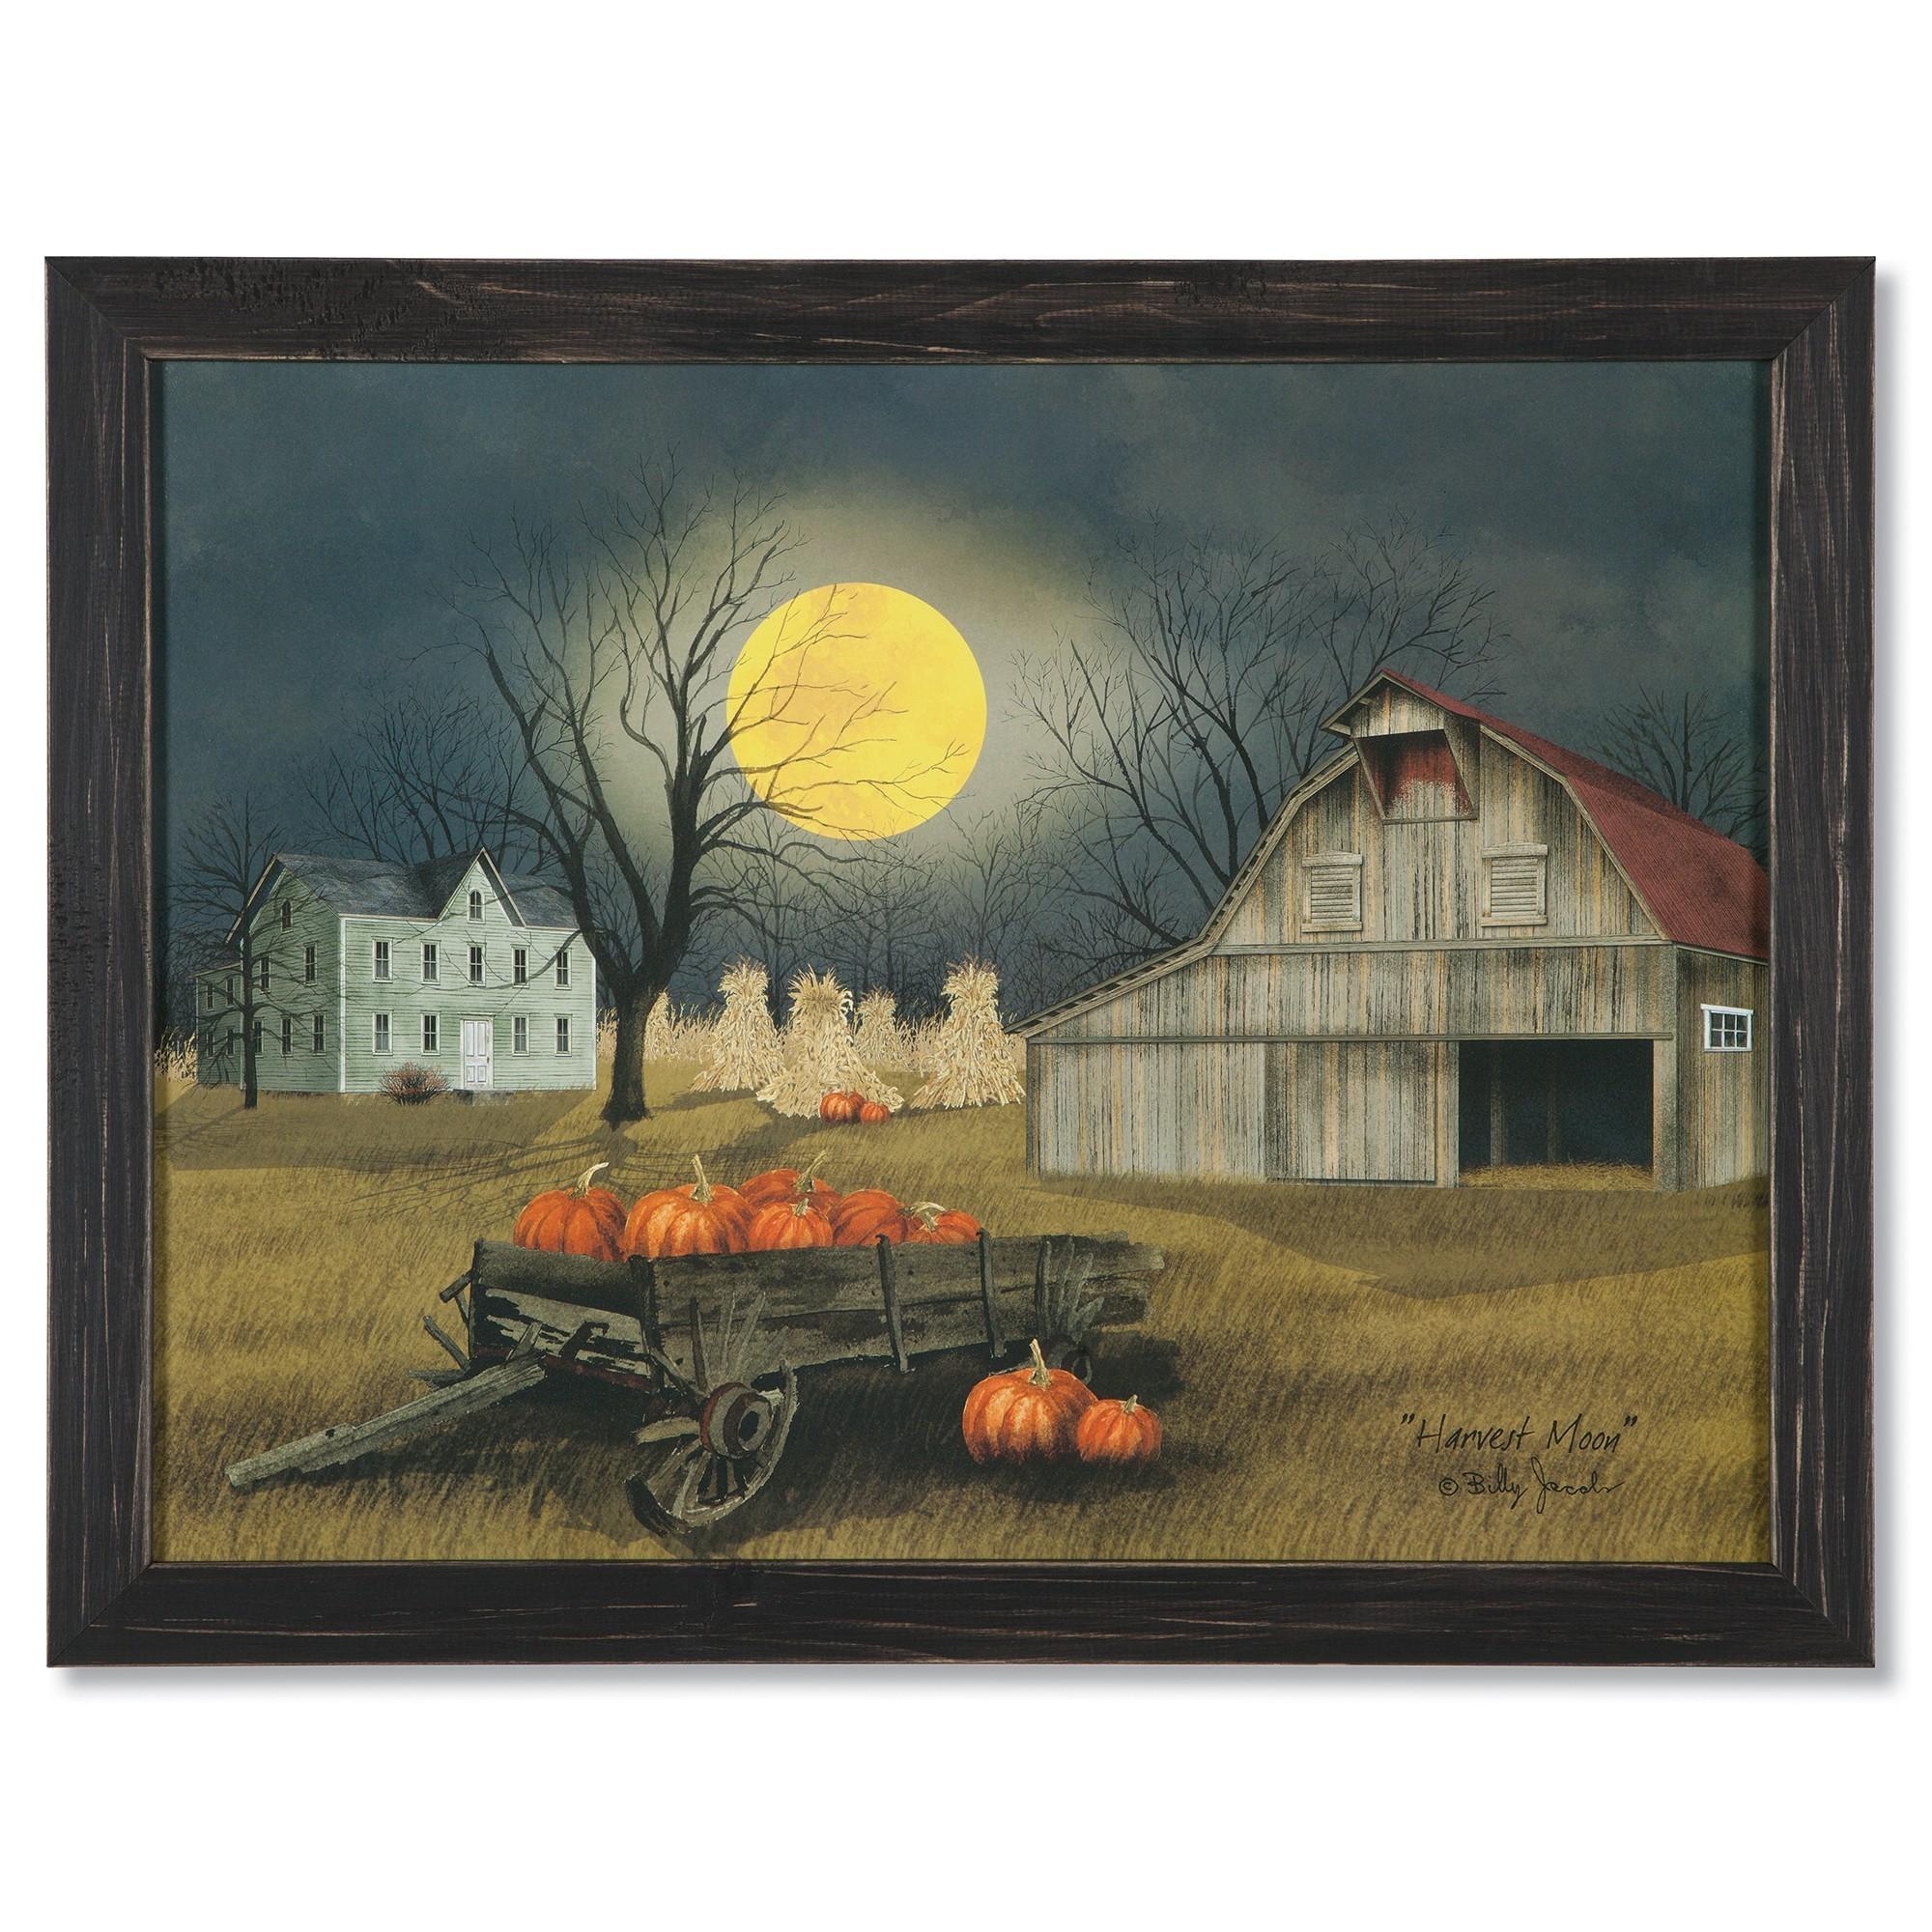 Billy Jacobs Harvest Moon | Folk Art Prints | Sturbridge Yankee Regarding Billy Jacobs Framed Wall Art Prints (Image 7 of 20)